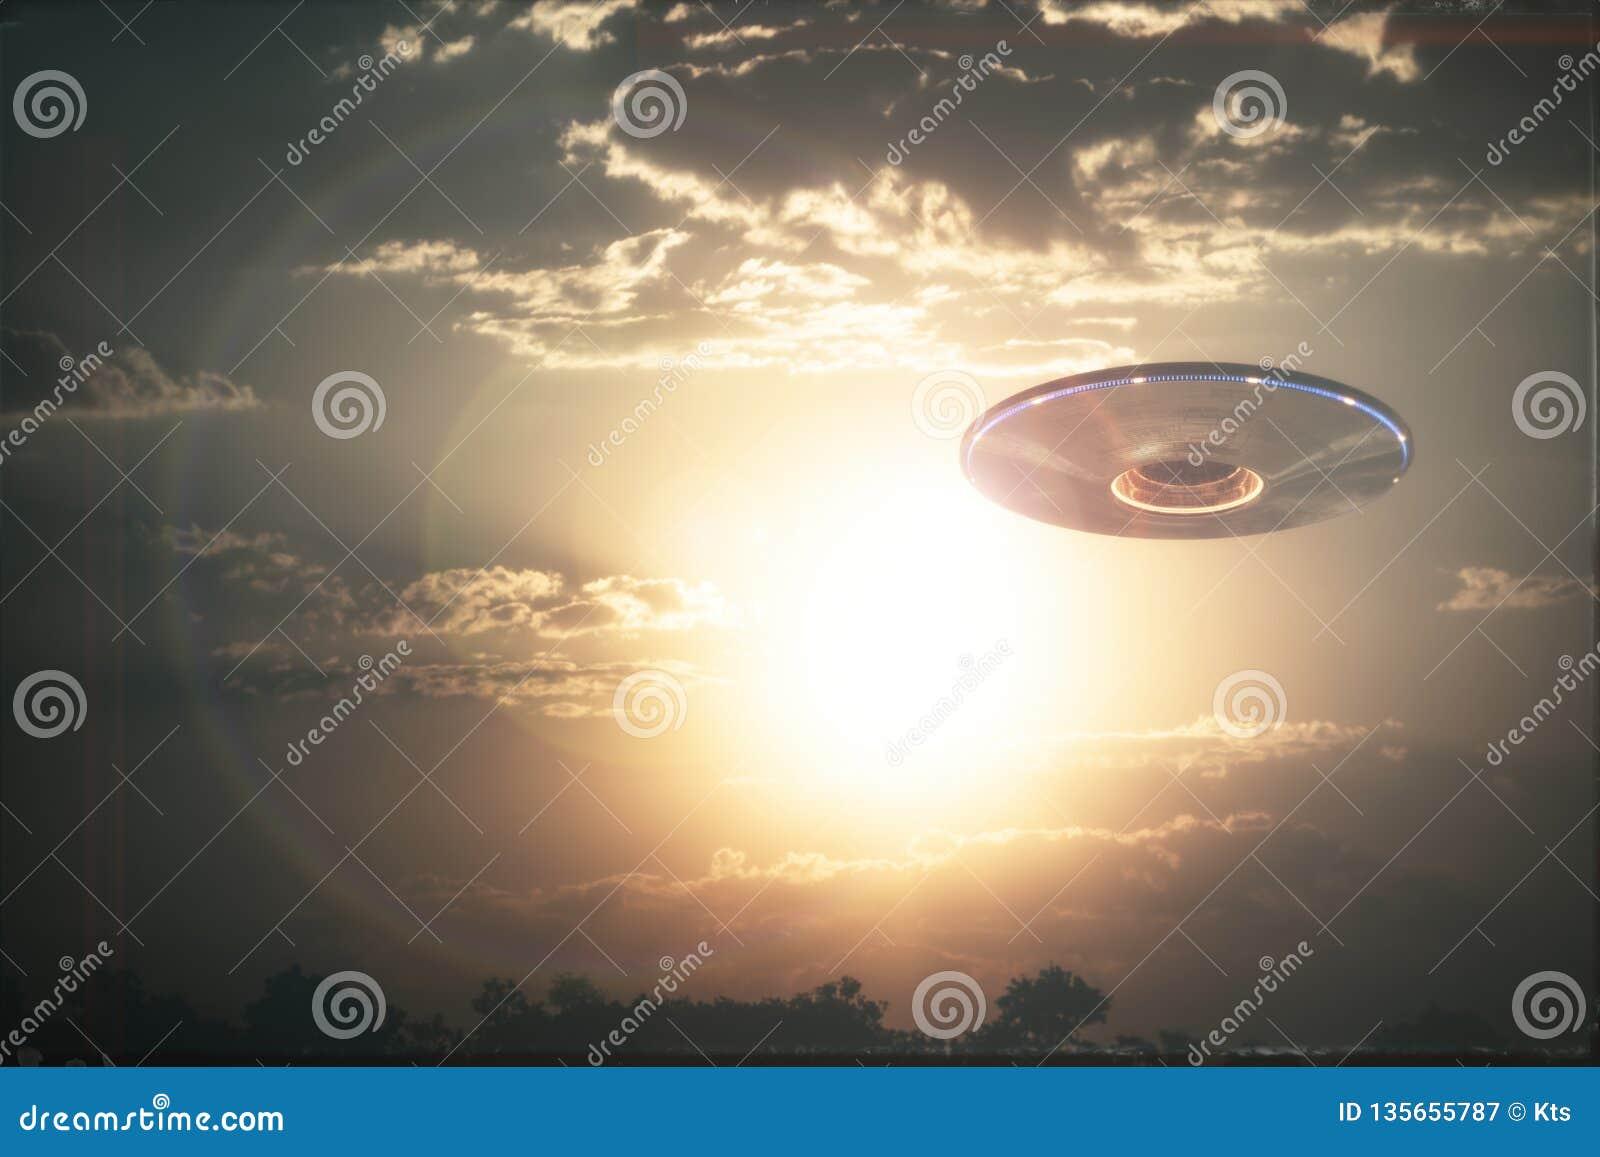 Unidentified Flying Object UFO Stock Image - Image of sightings